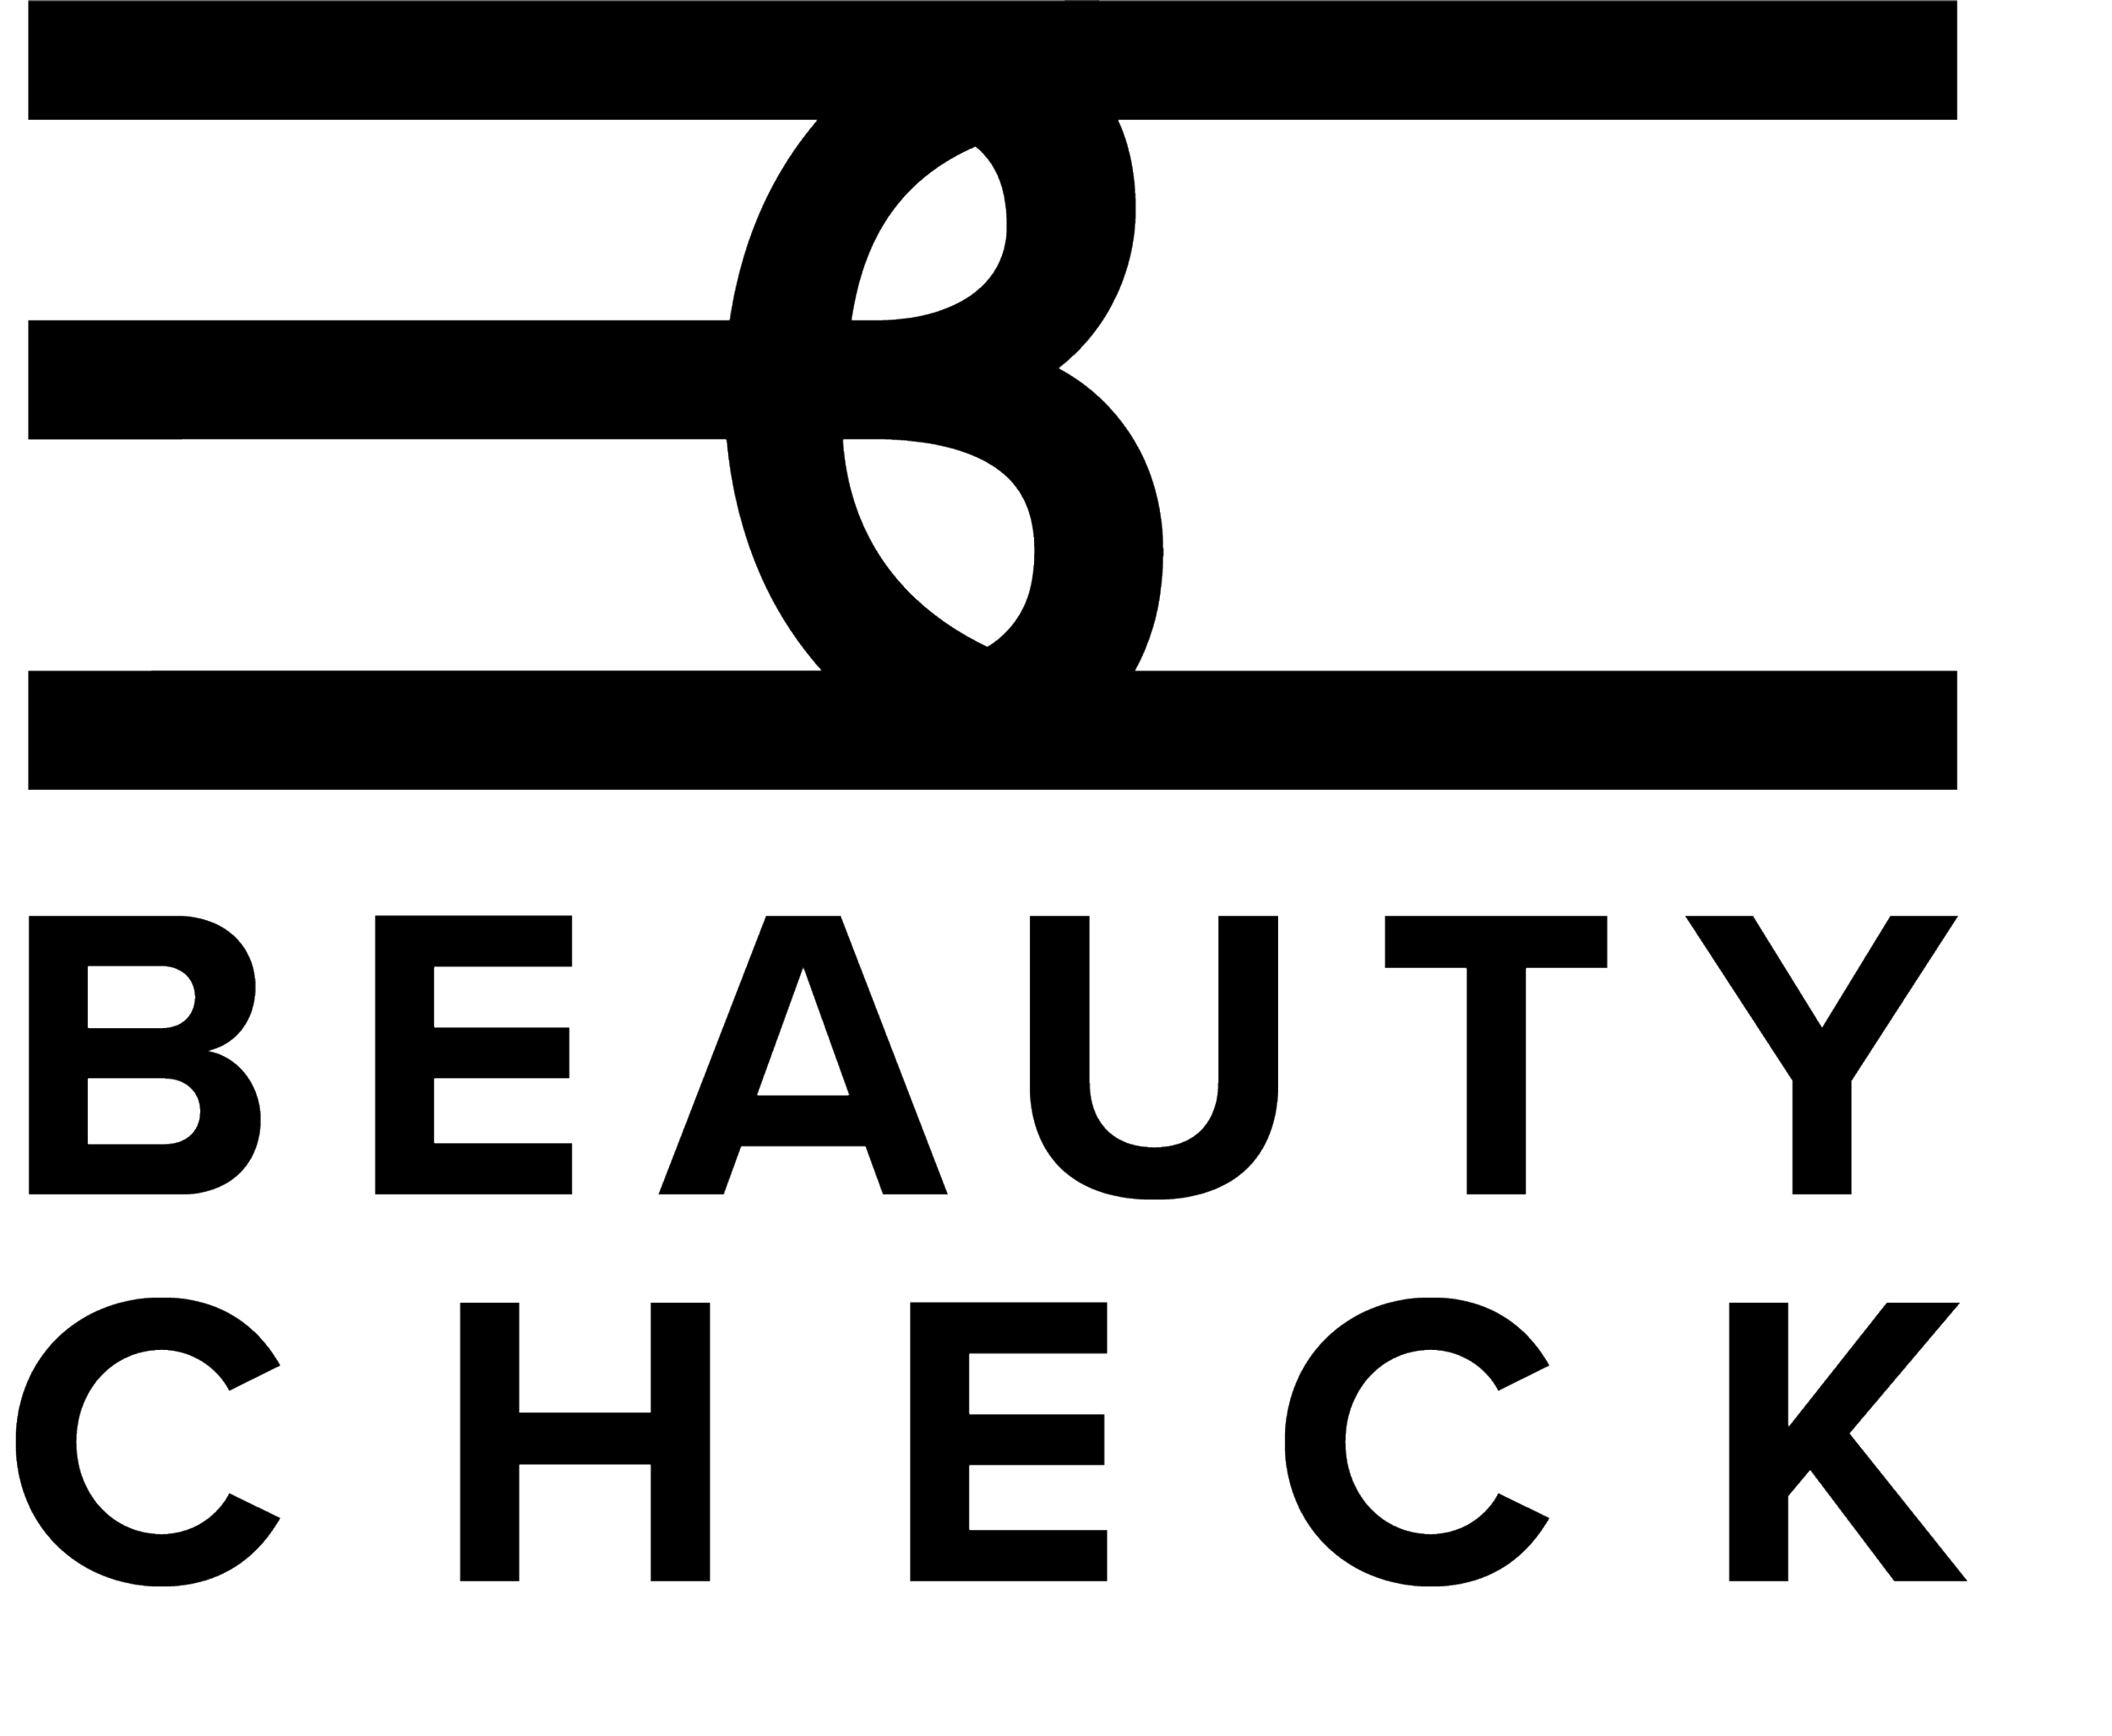 beautycheck.png